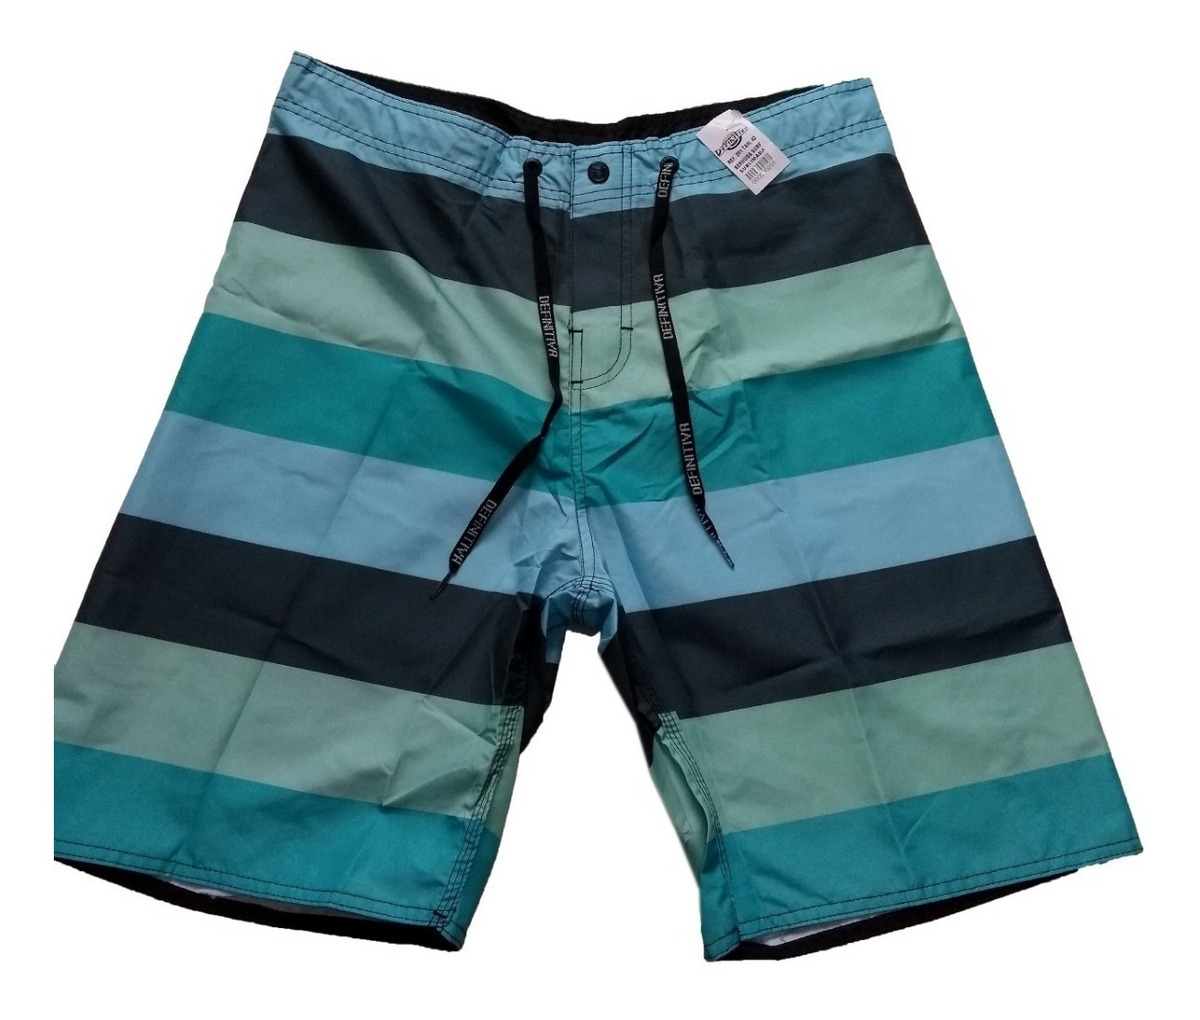 5752d9b58 Kit Com 05 Bermudas Praia Surf Adulto Estampada - Atacado - R$ 60,00 ...